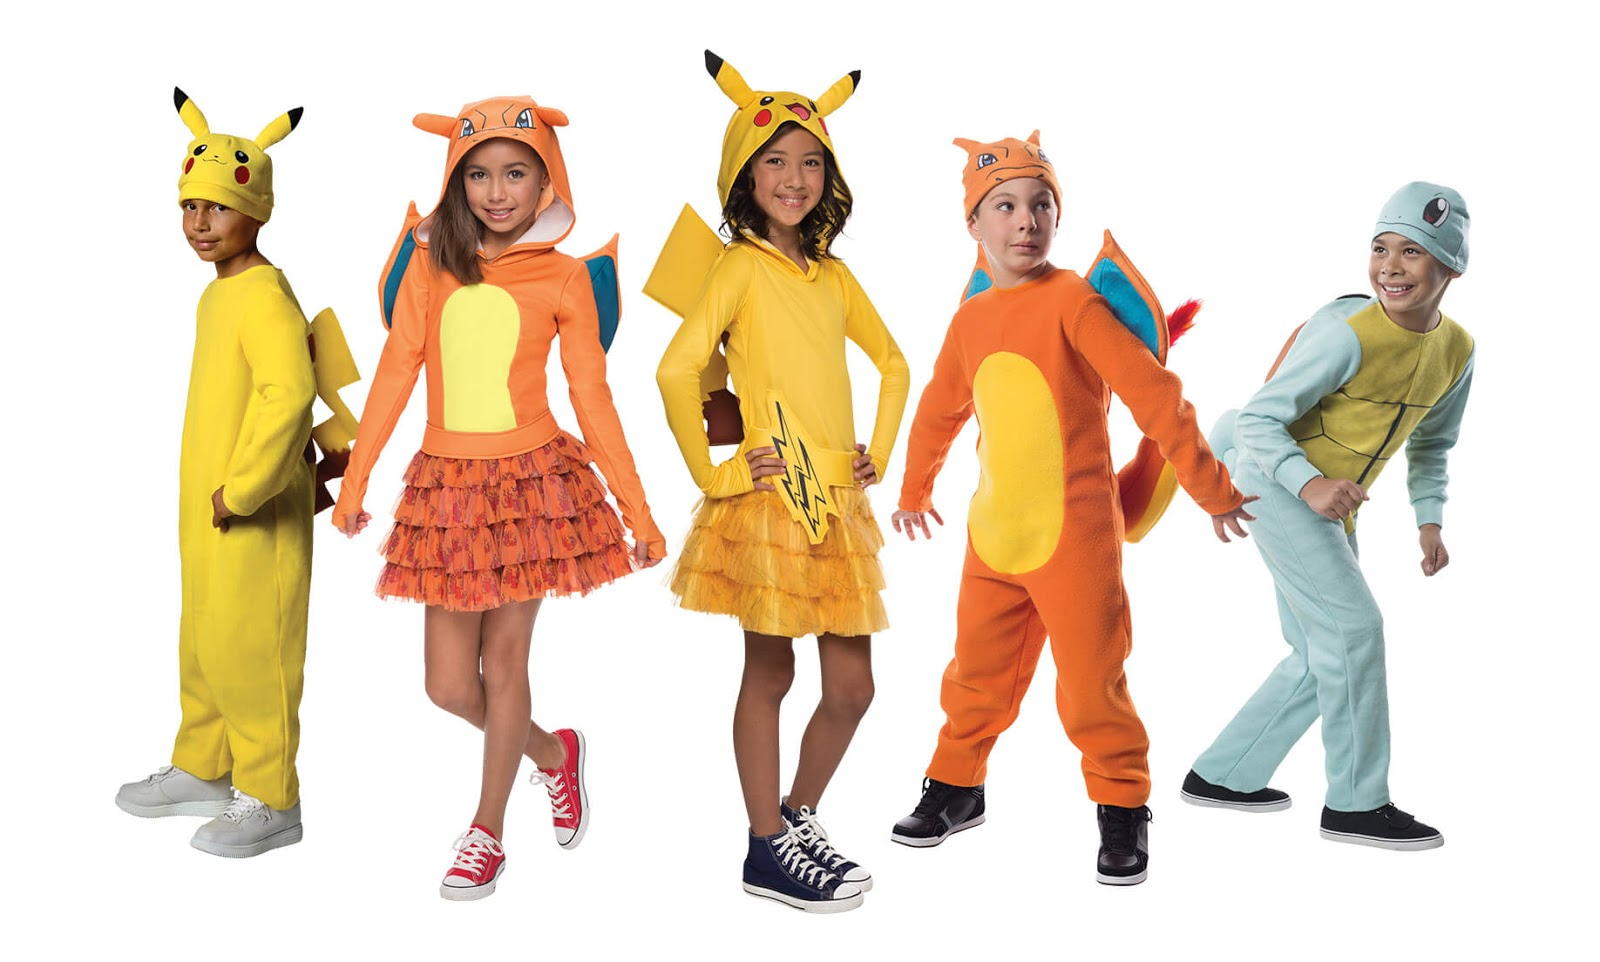 Easy diy homemade halloween pokemon costumes for kids for Simple halloween costumes for kids